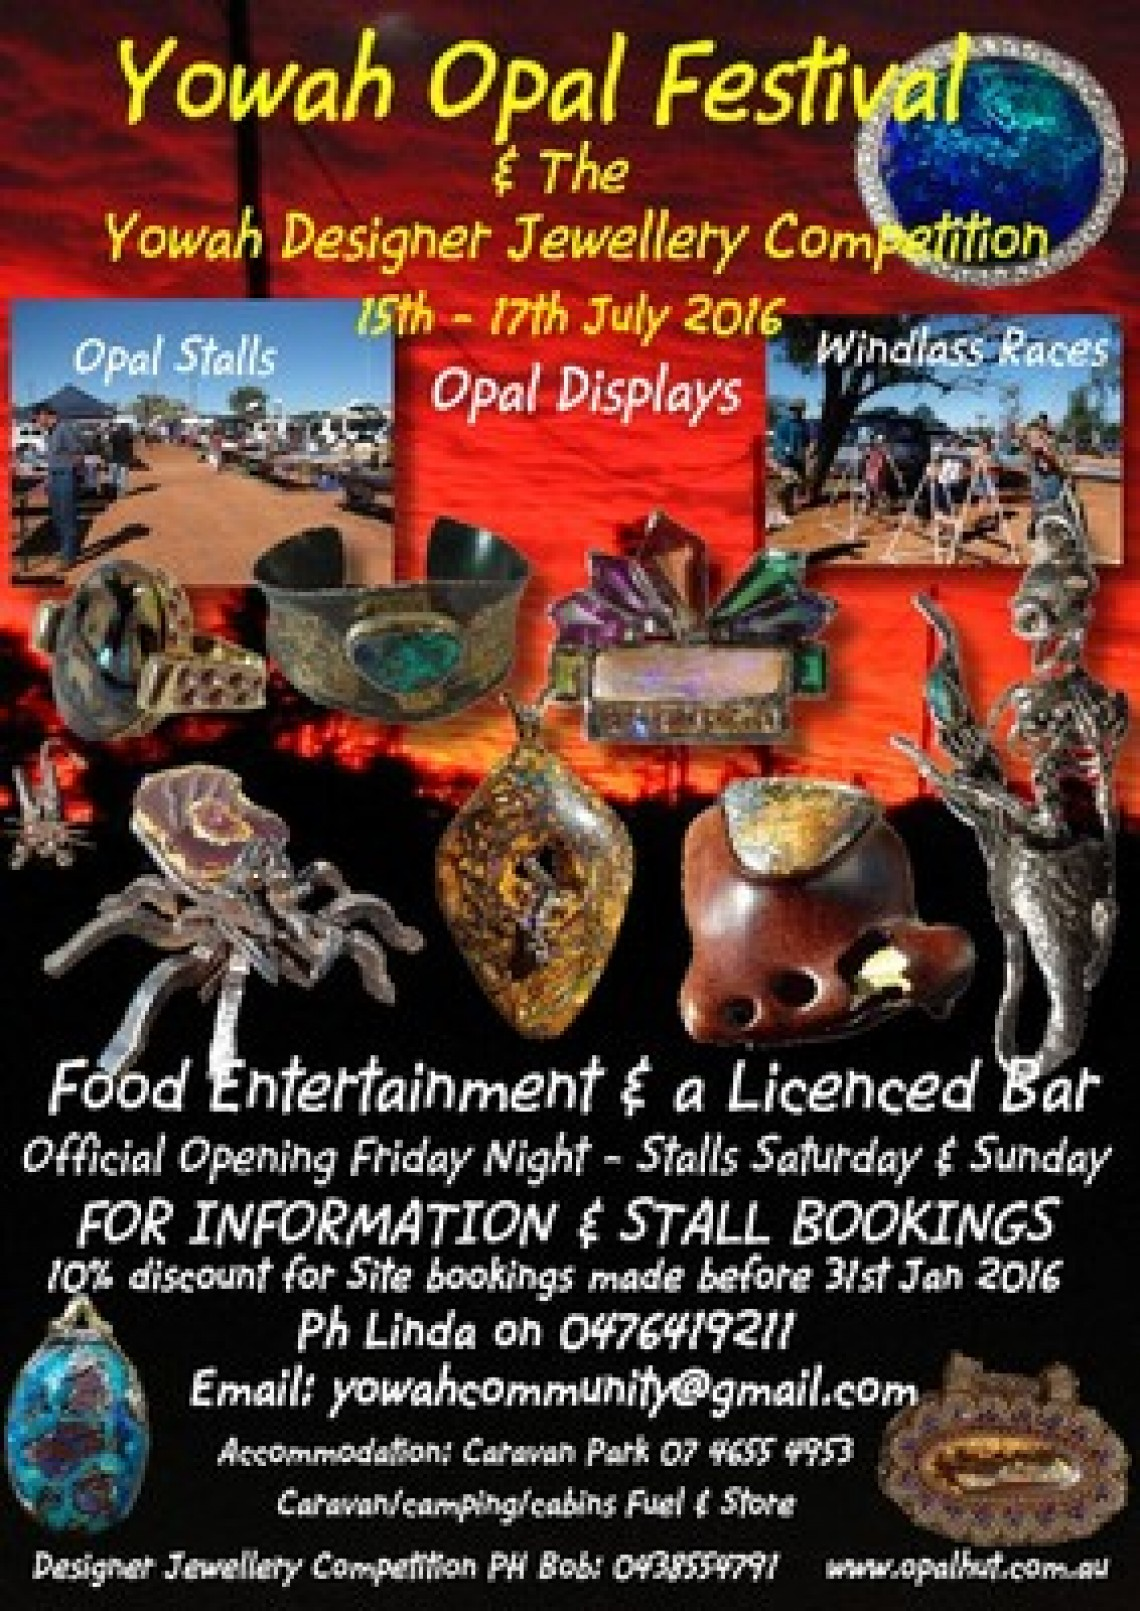 yowah opal festival